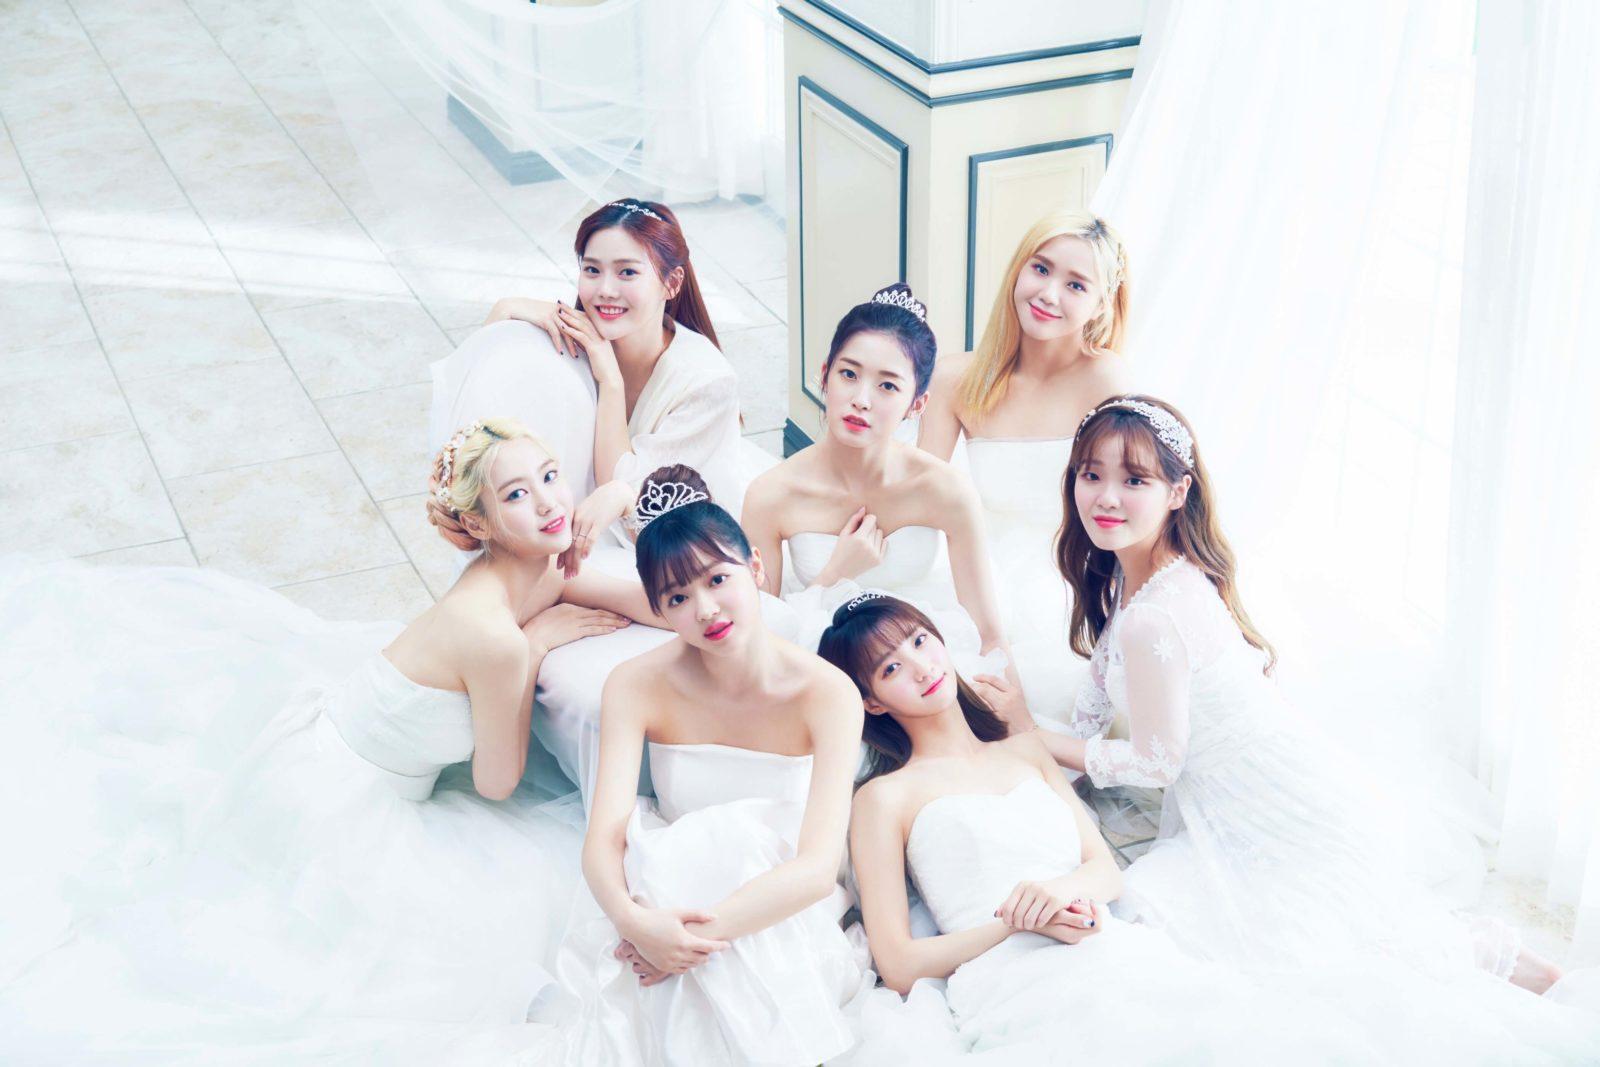 OH MY GIRL、Mnet「Queendom」バトル曲「Guerilla」初披露決定サムネイル画像